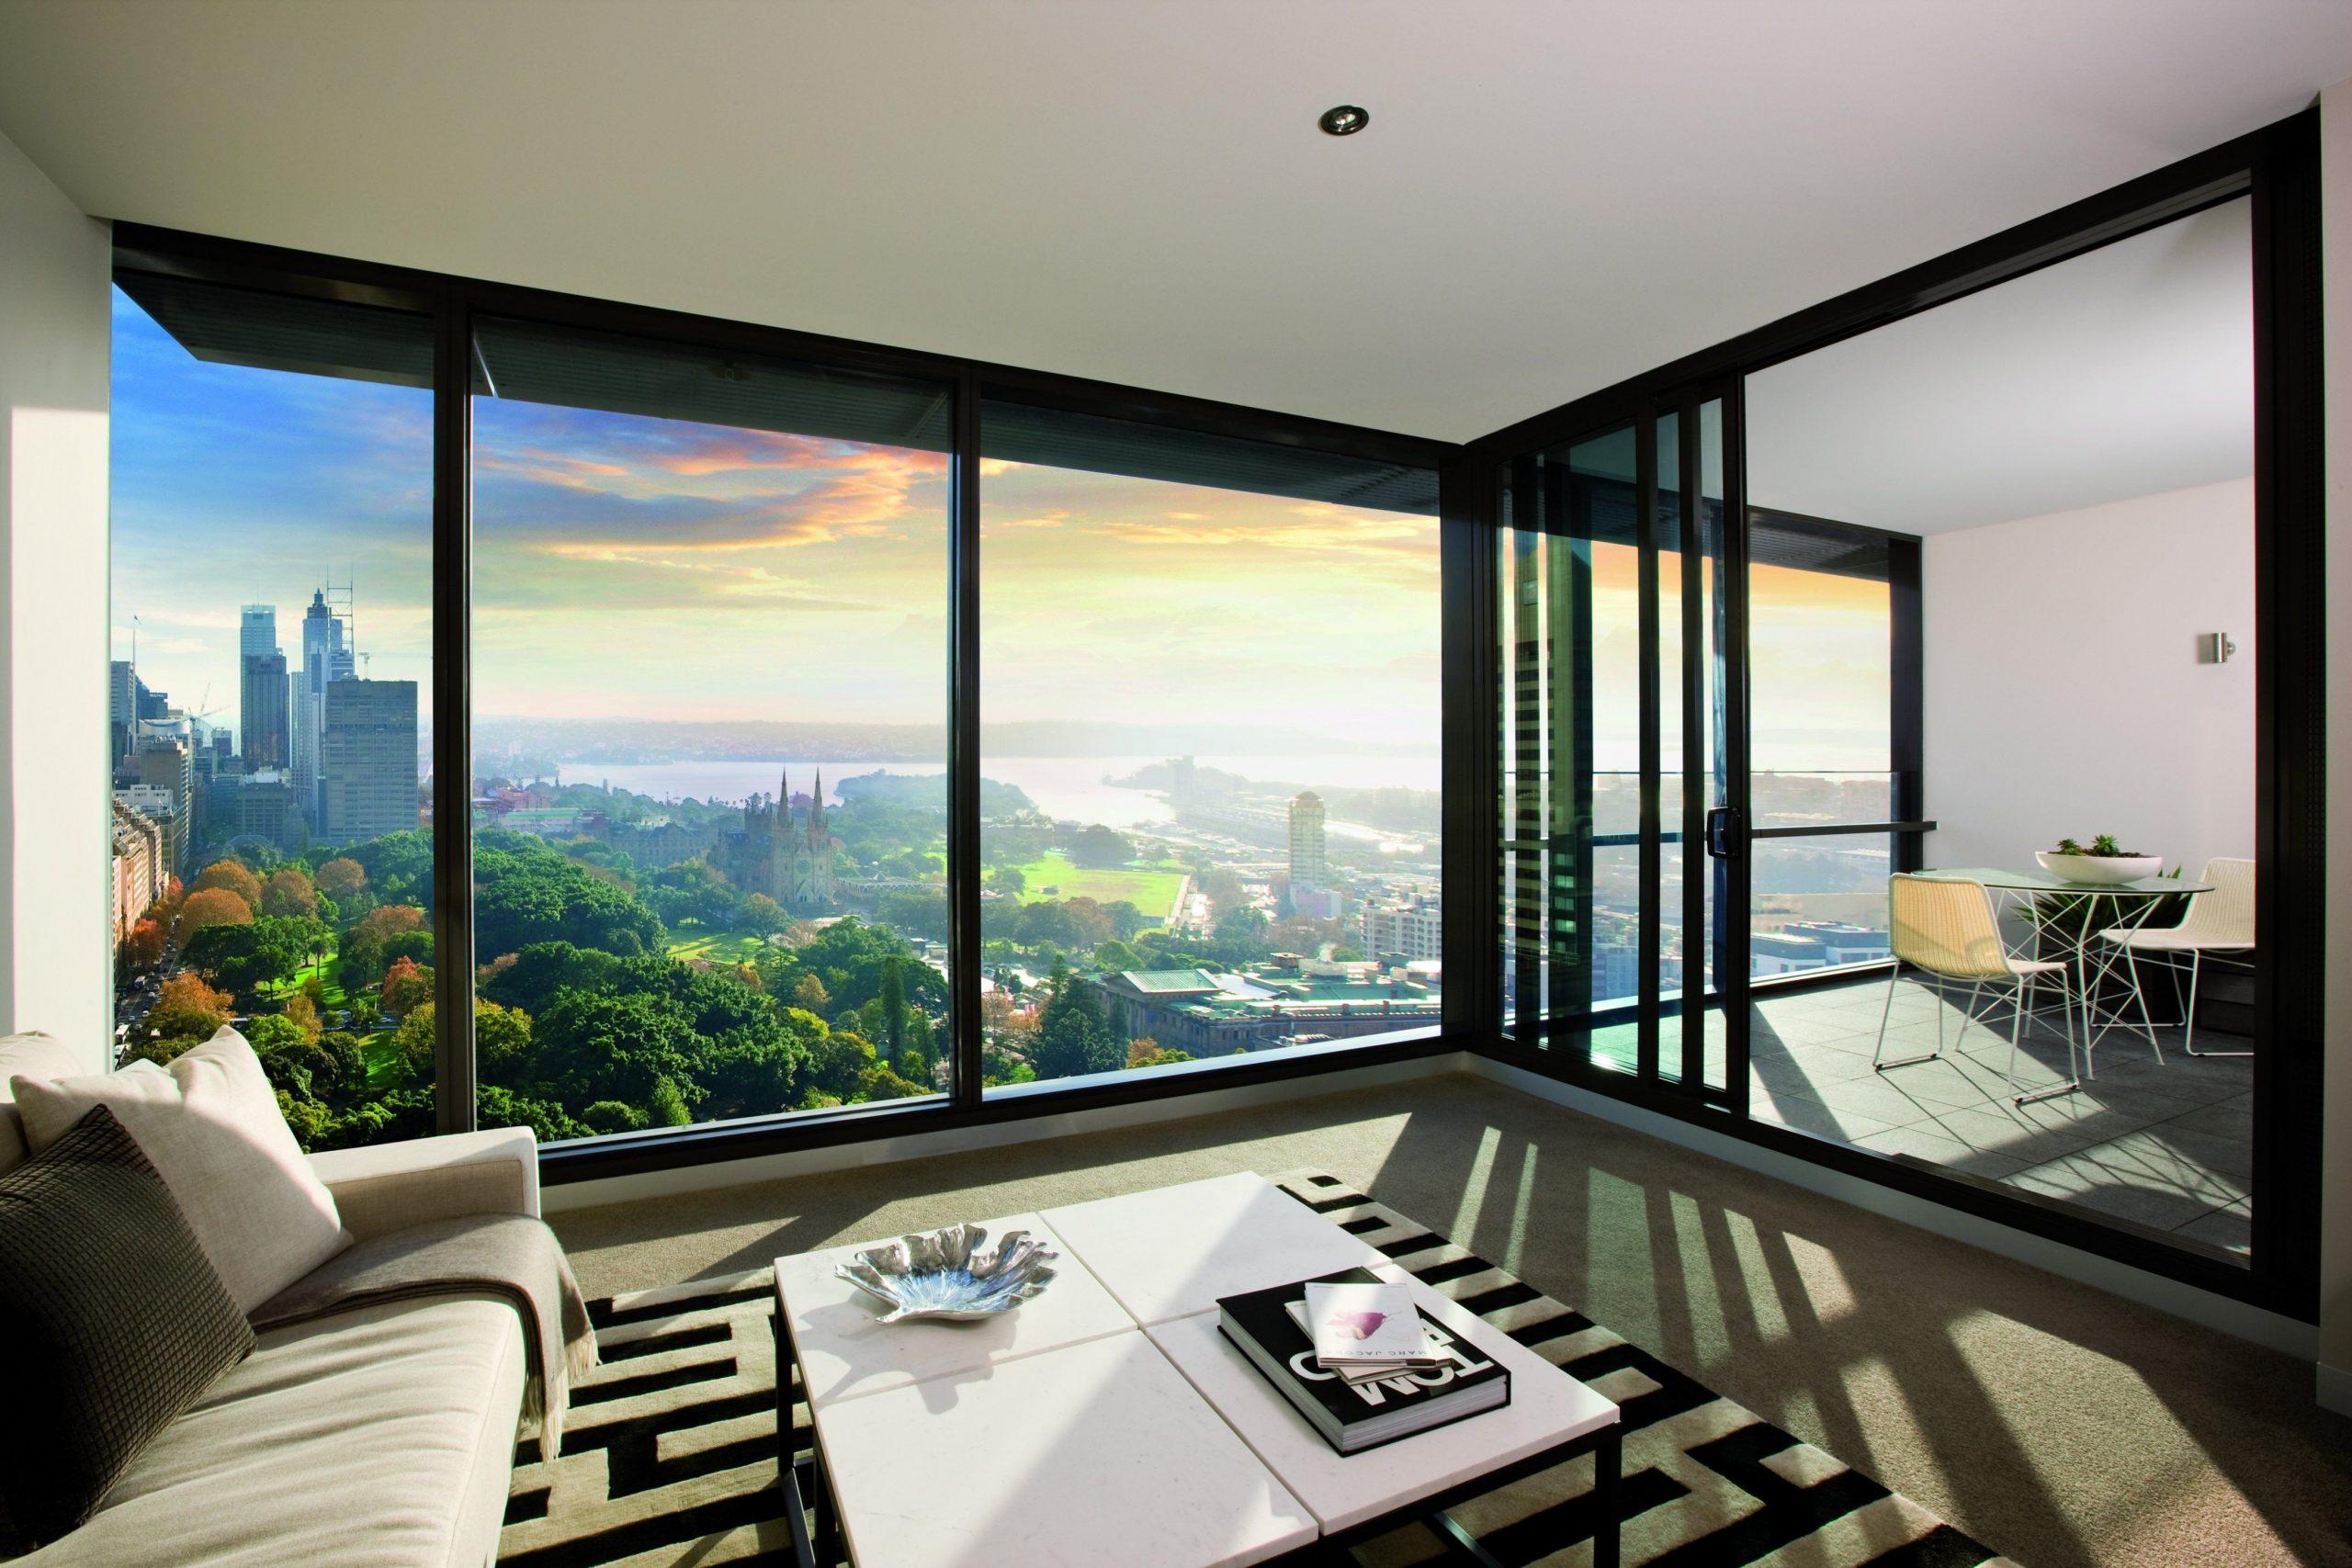 photos apartment hd  Condo interior, Luxury apartments, Apartment  - Apartment Design Hd